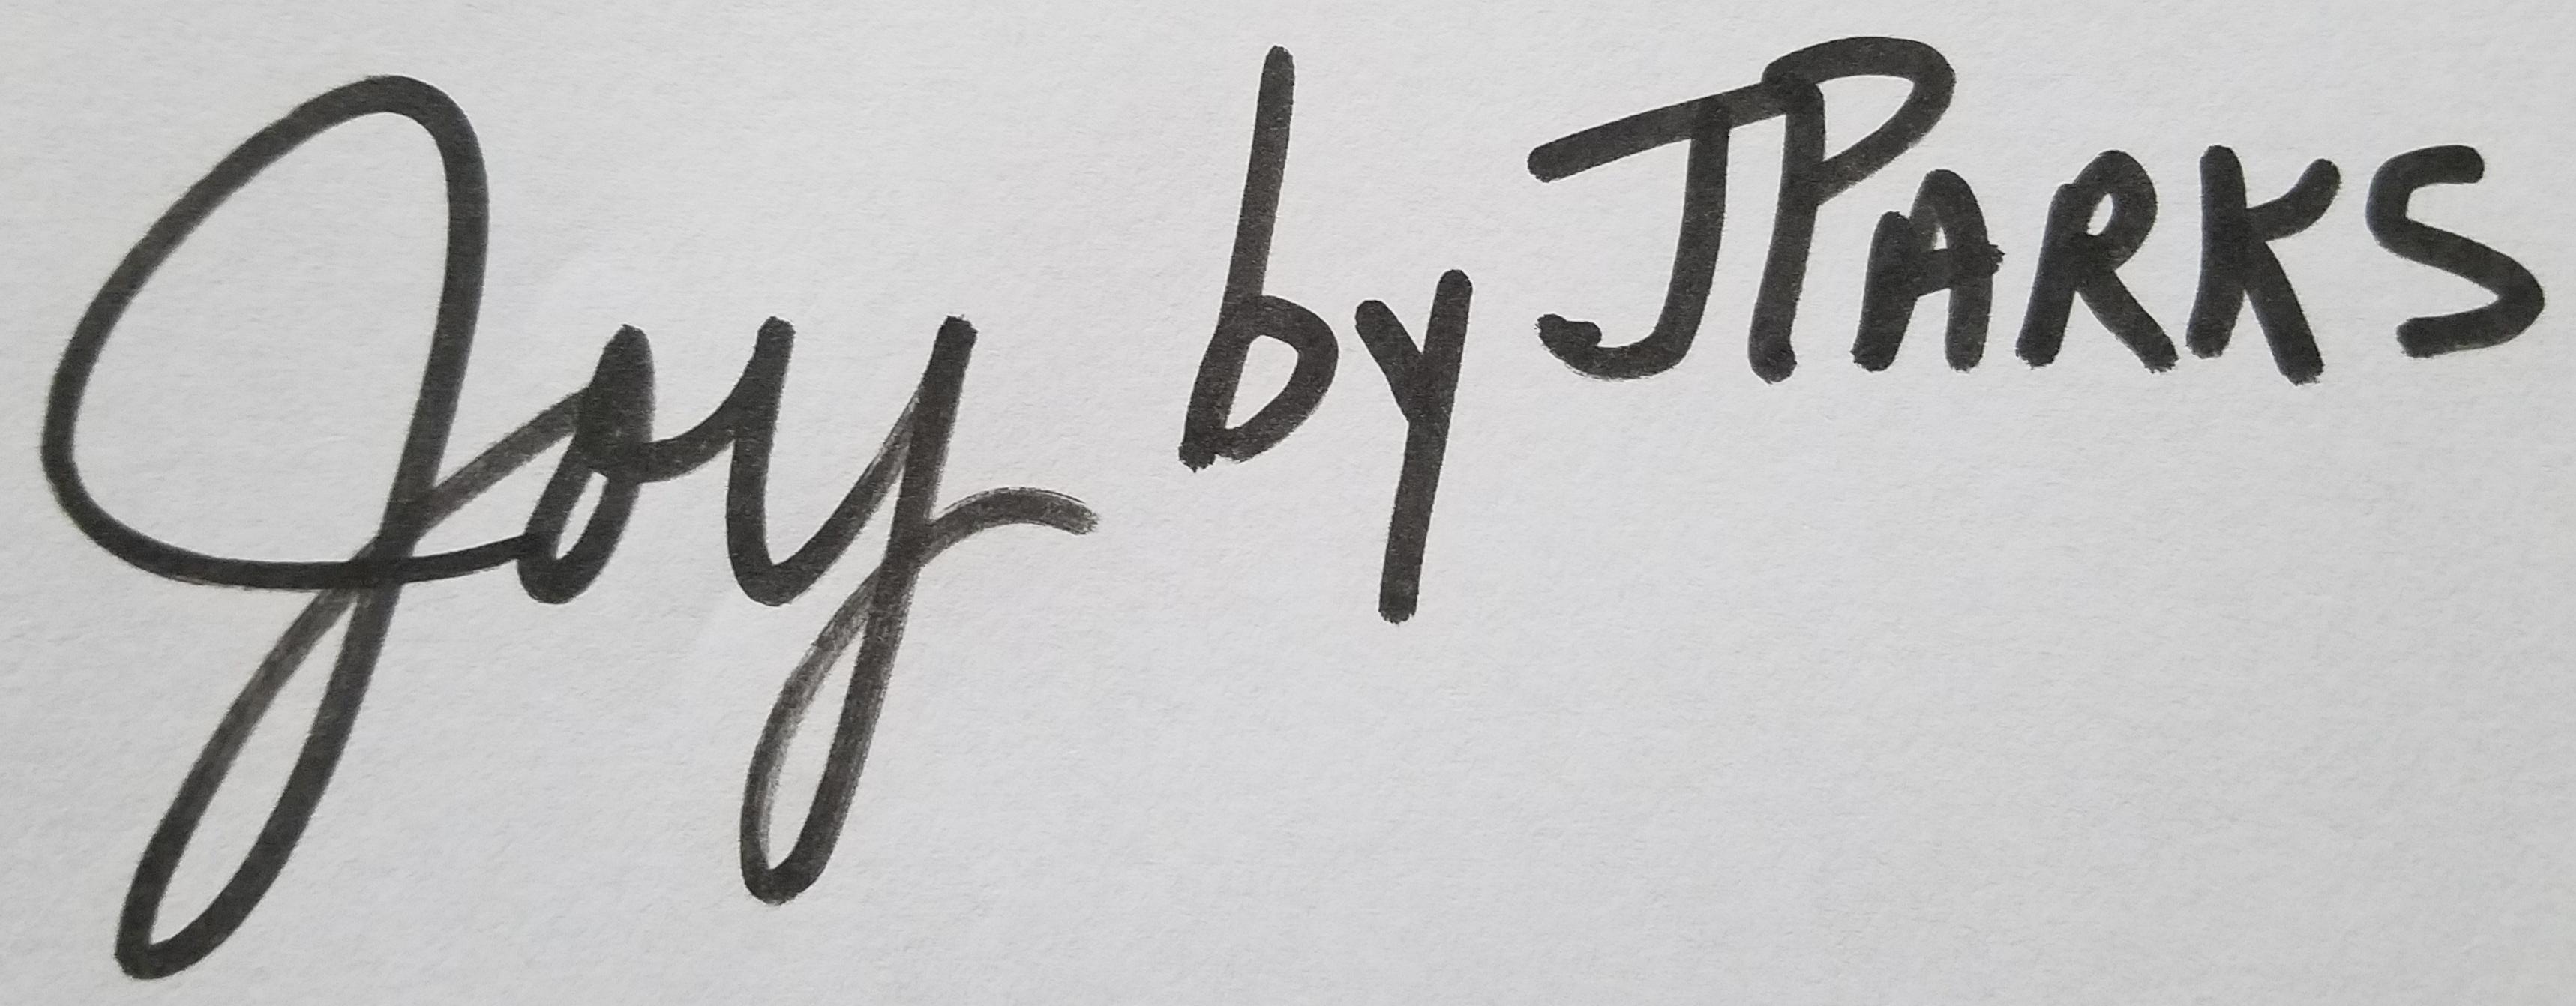 Joy Parks Coats Signature